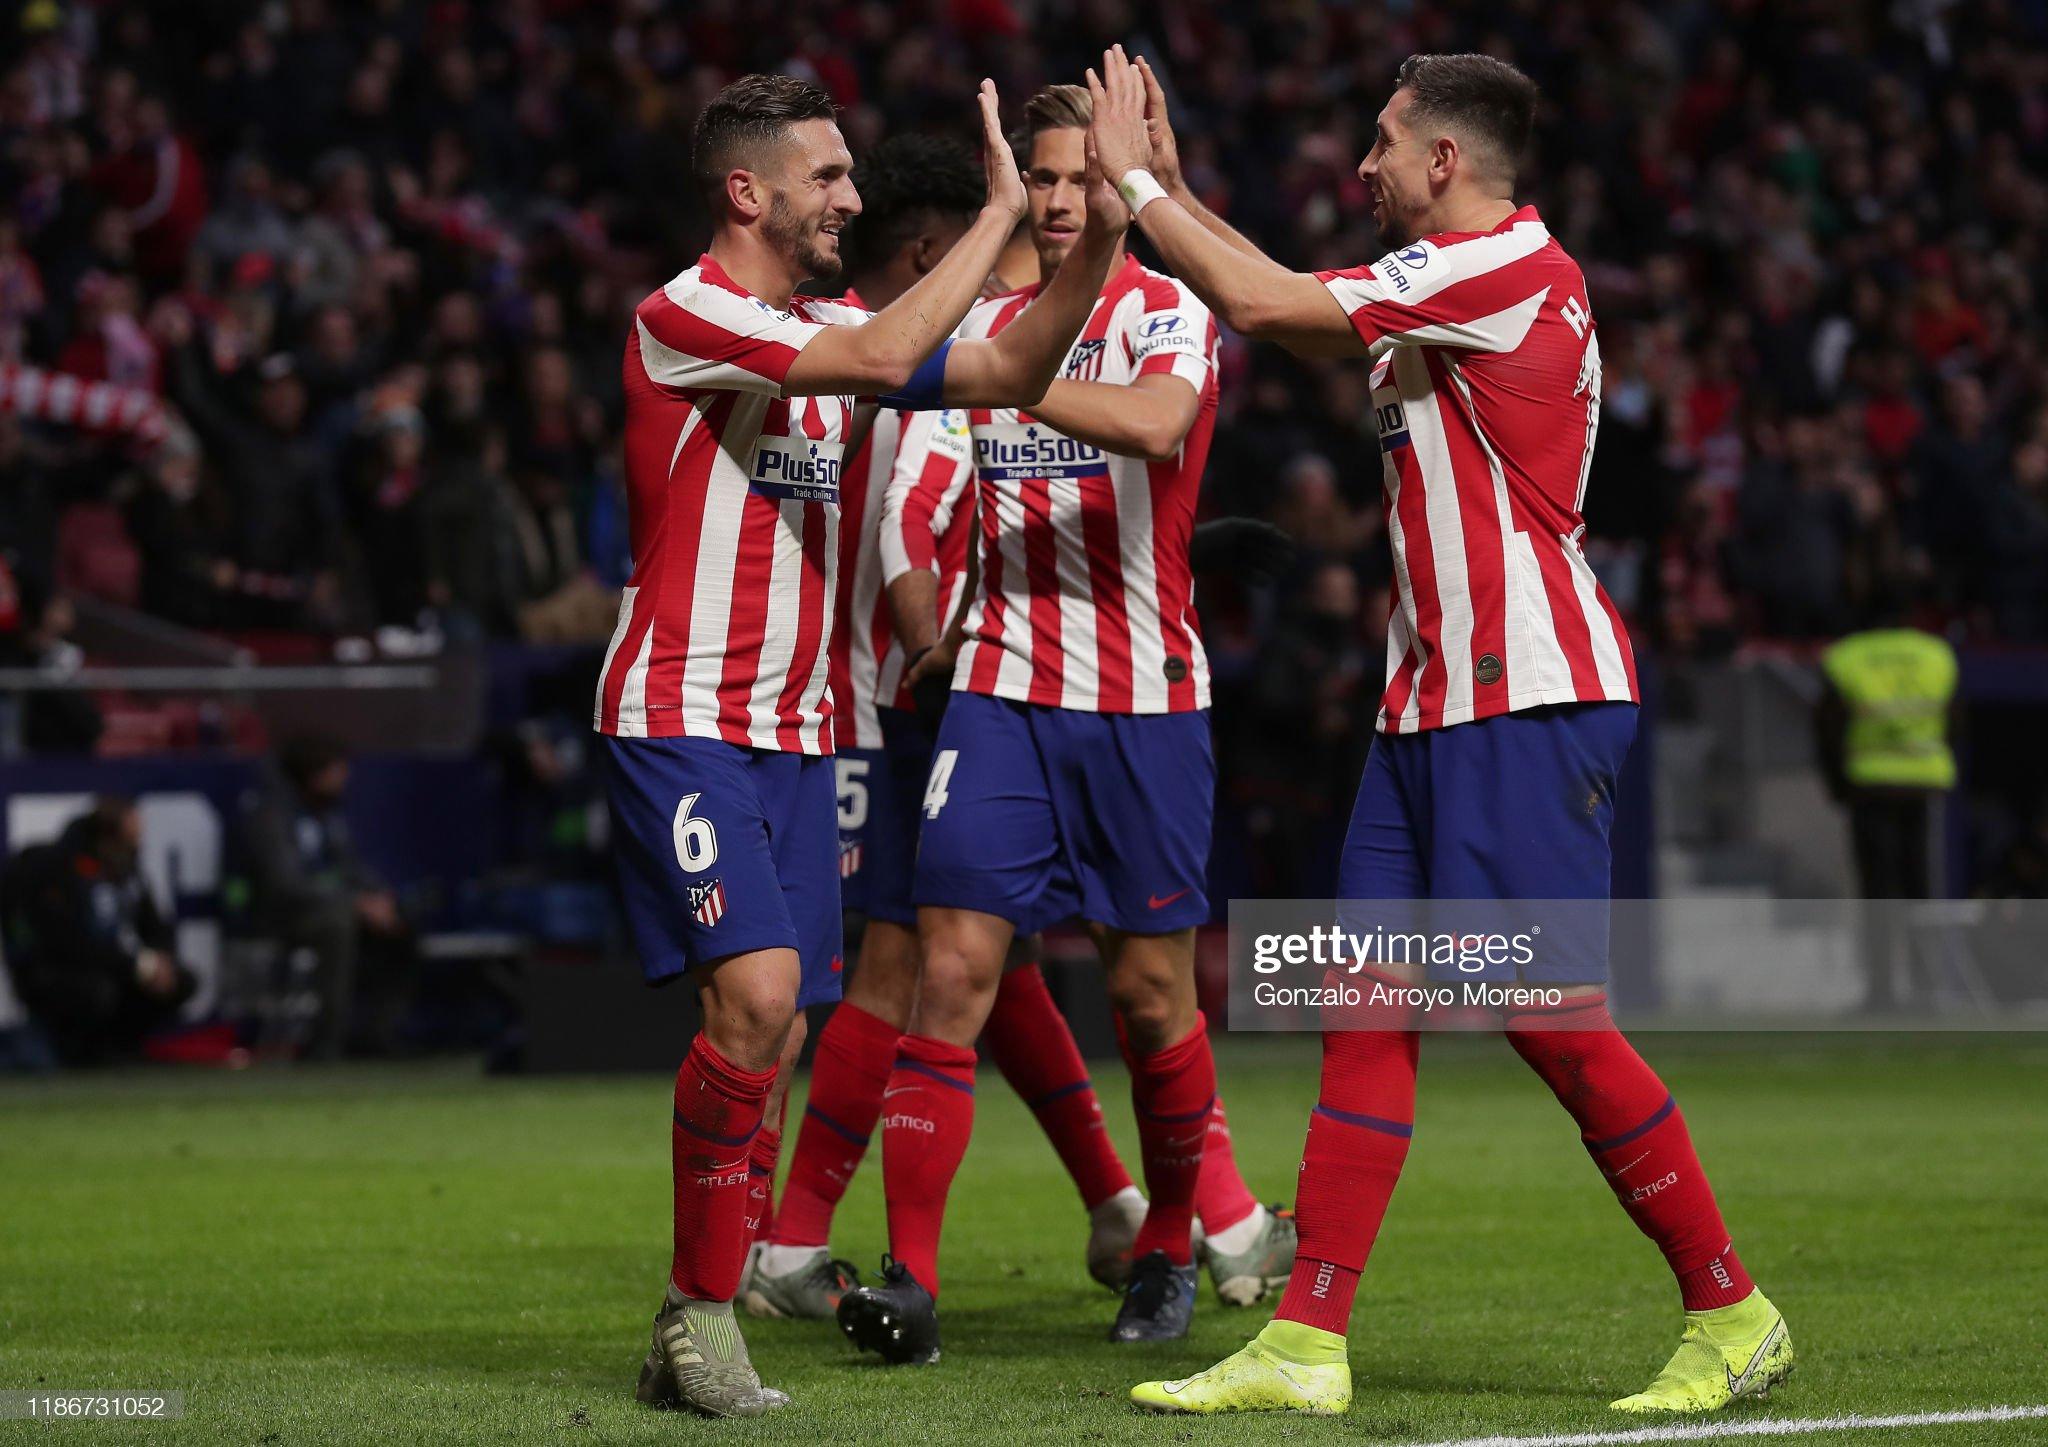 ¿Cuánto mide Héctor Herrera? - Altura - Página 2 Koke-of-atletico-madrid-celebrates-with-teammates-after-scoring-his-picture-id1186731052?s=2048x2048